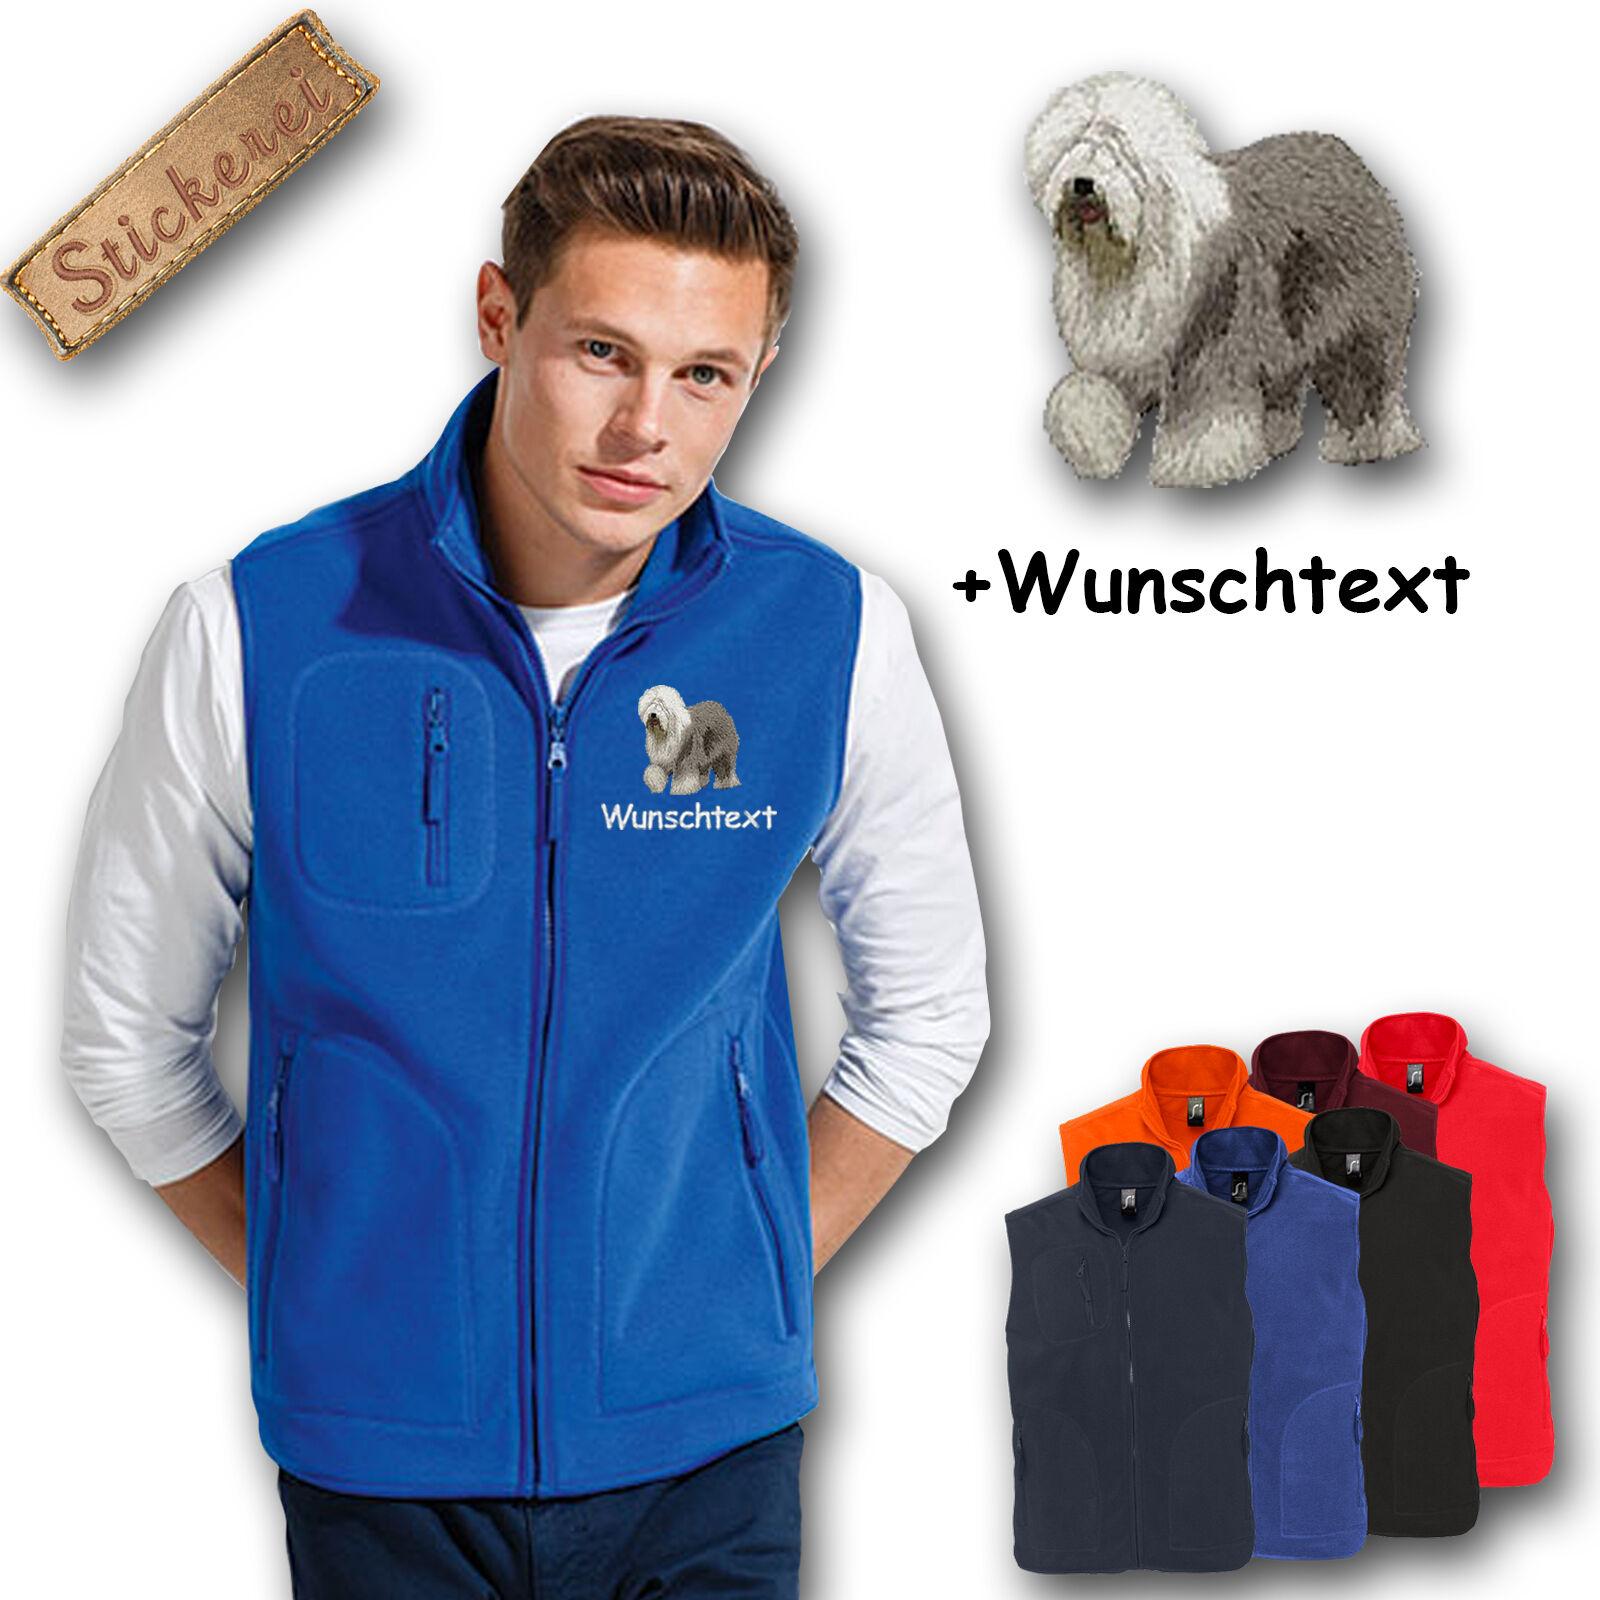 Fleece vest Fleece Vest embroidered Embroidery Bobtail + Name